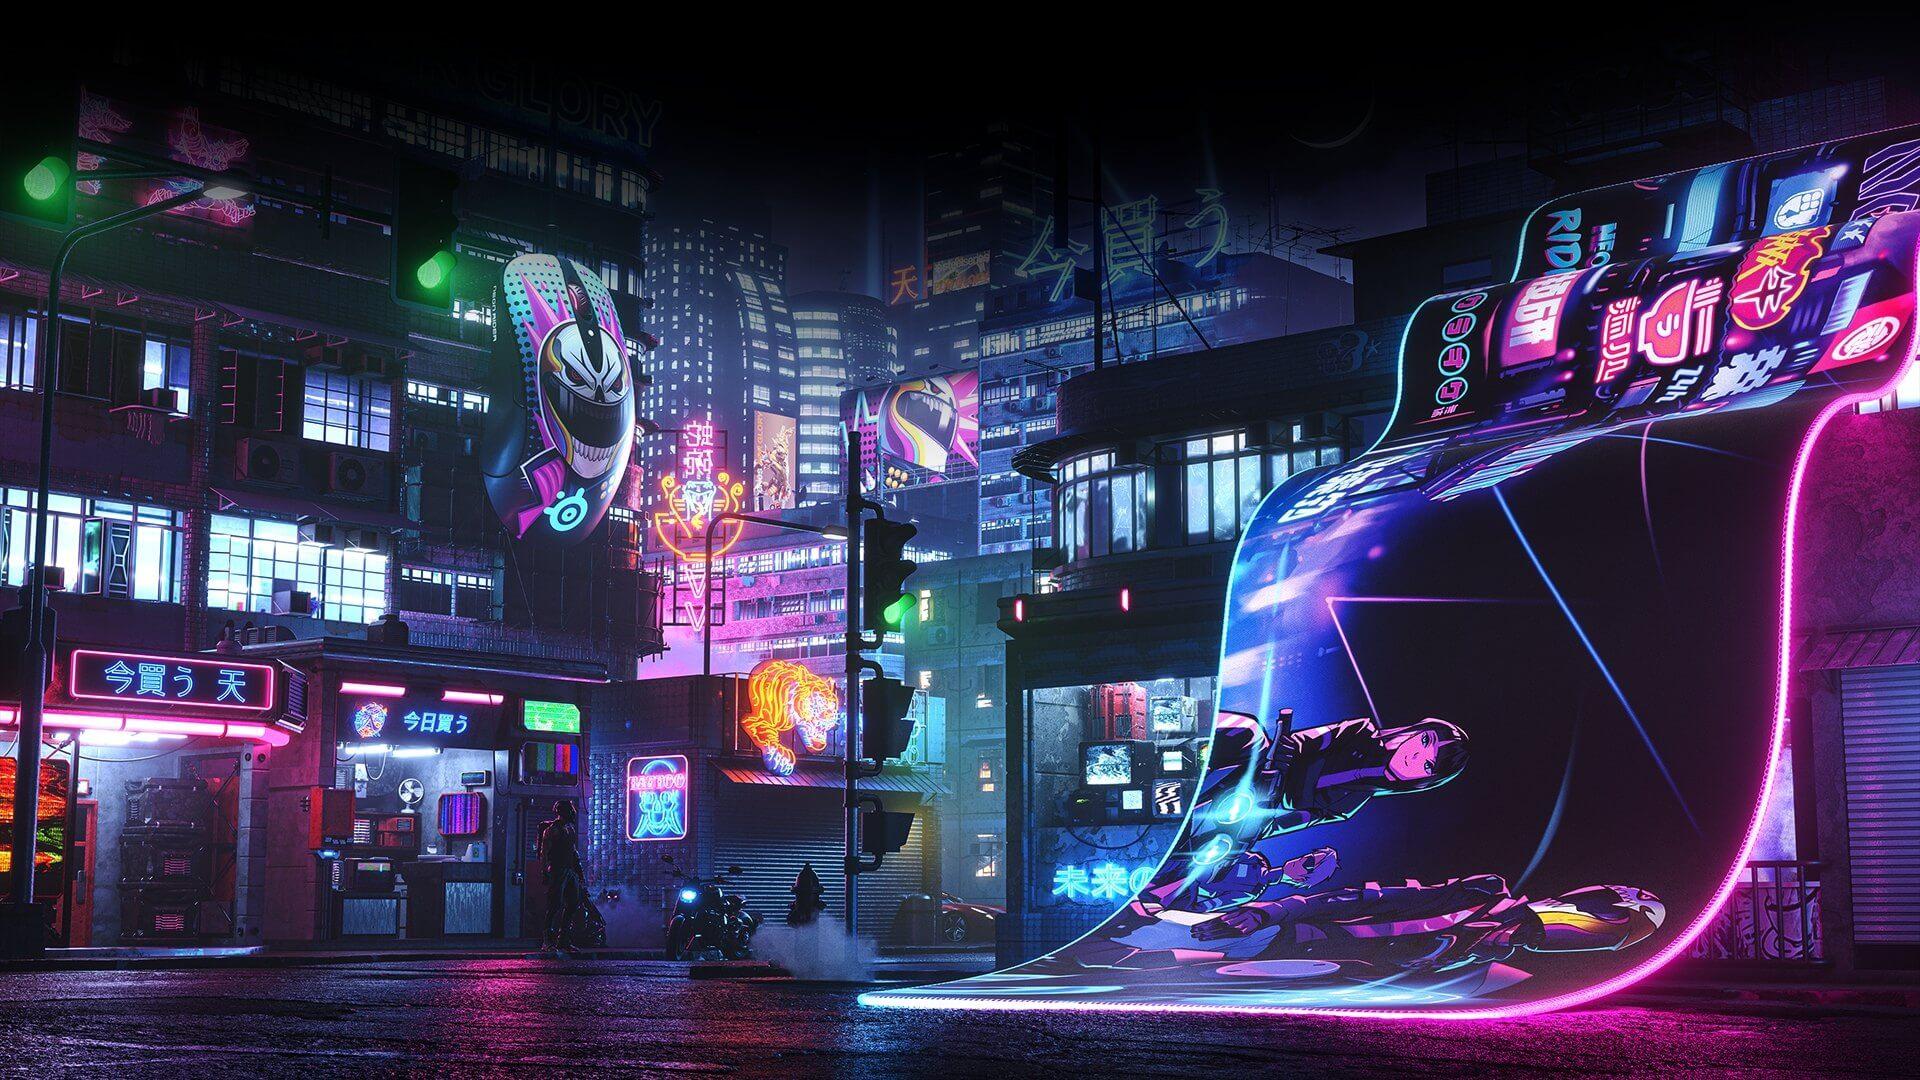 Giới thiệu Chuột Chơi game SteelSeries Sensei Ten Neon Rider Edition (62528) (USB/RGB/NeonRider)